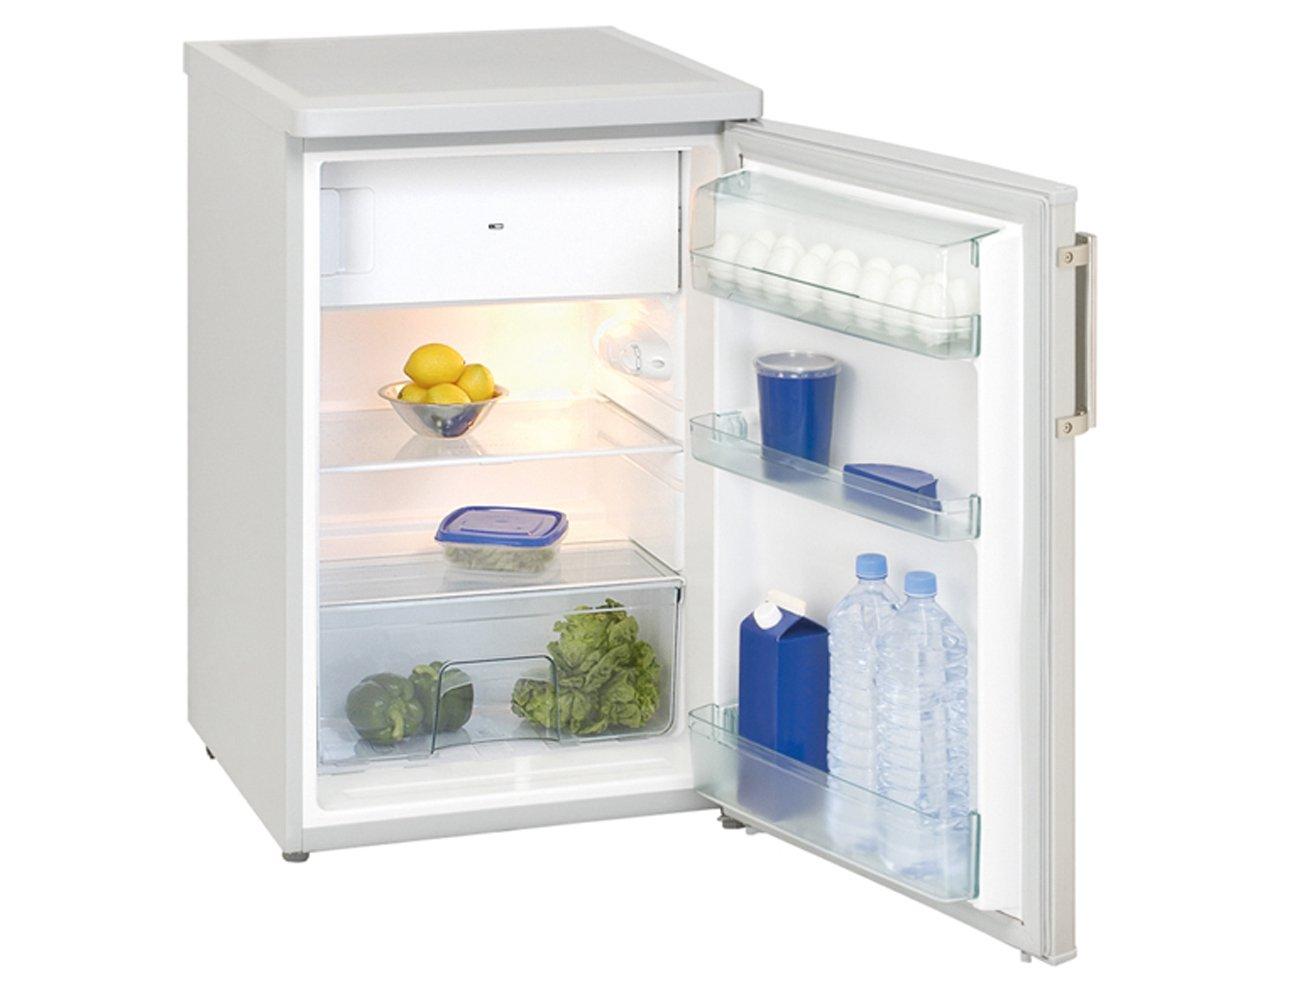 Amica Kühlschrank Uvks 16149 : Exquisit ks16 4sil kühlschrank a 131 kwh jahr 103 l kühlteil